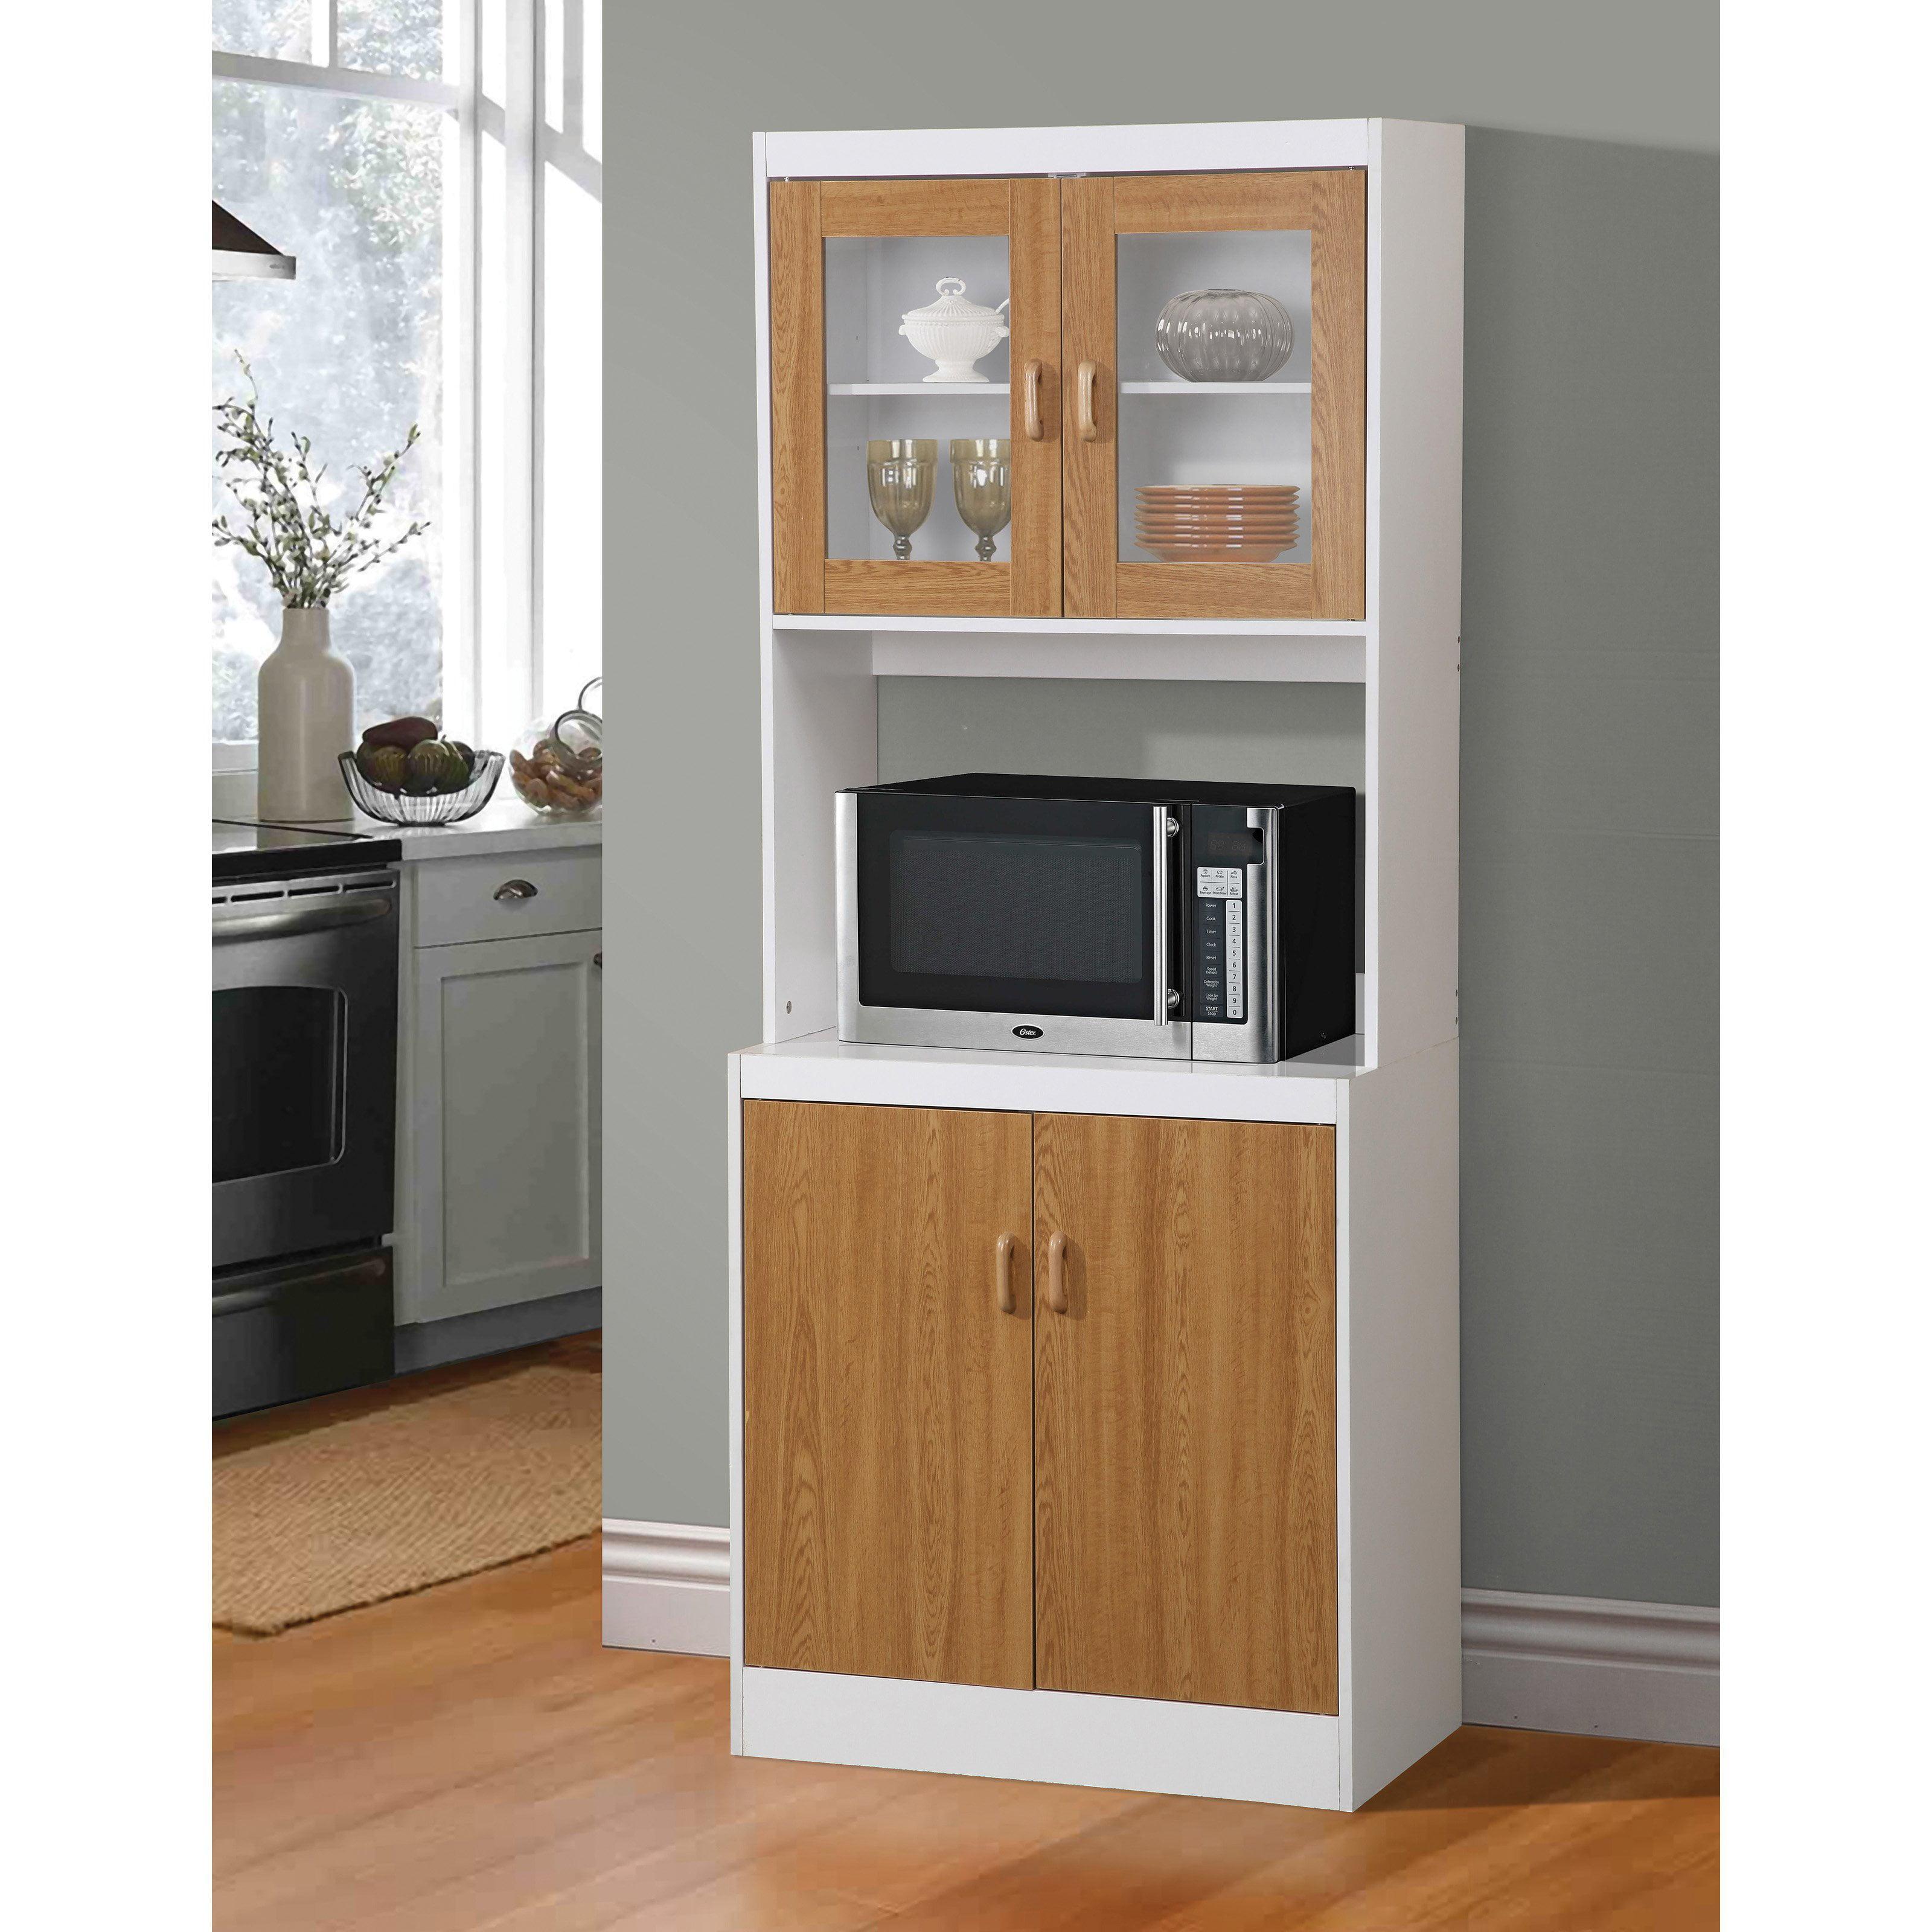 Mainstays Storage Cabinet, Multiple Finishes - Walmart.com